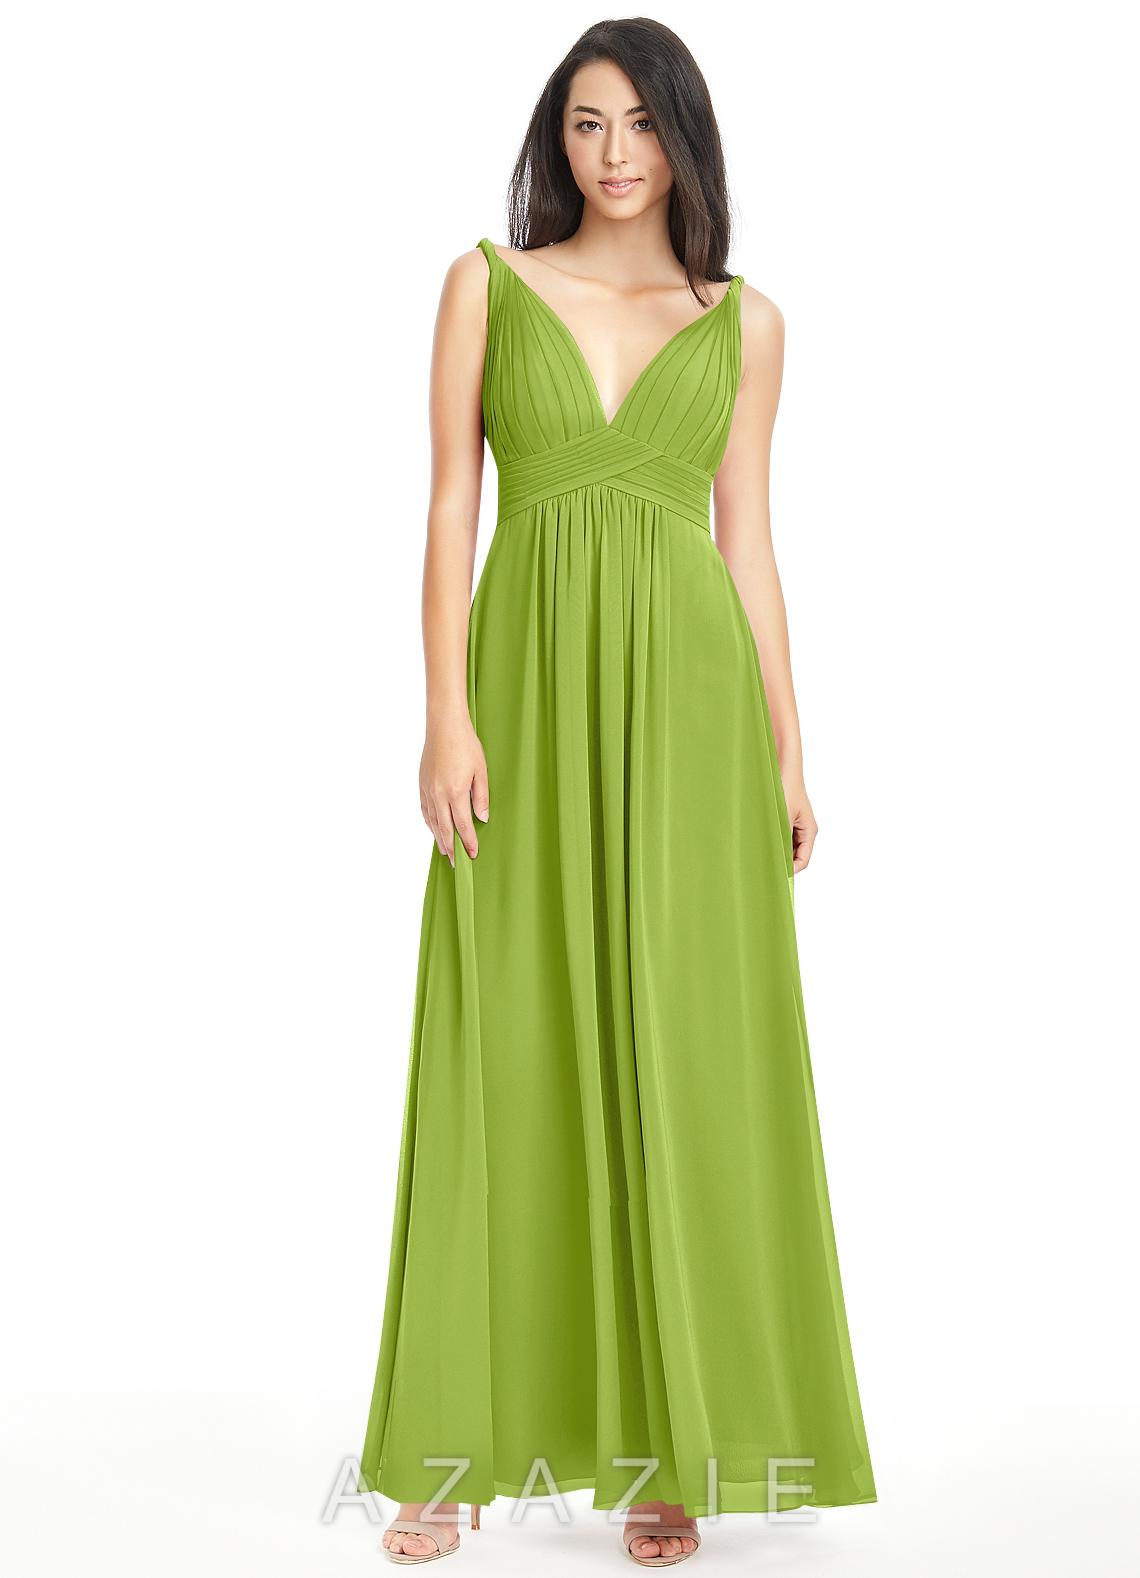 Azazie maren bridesmaid dress azazie loading zoom ombrellifo Images